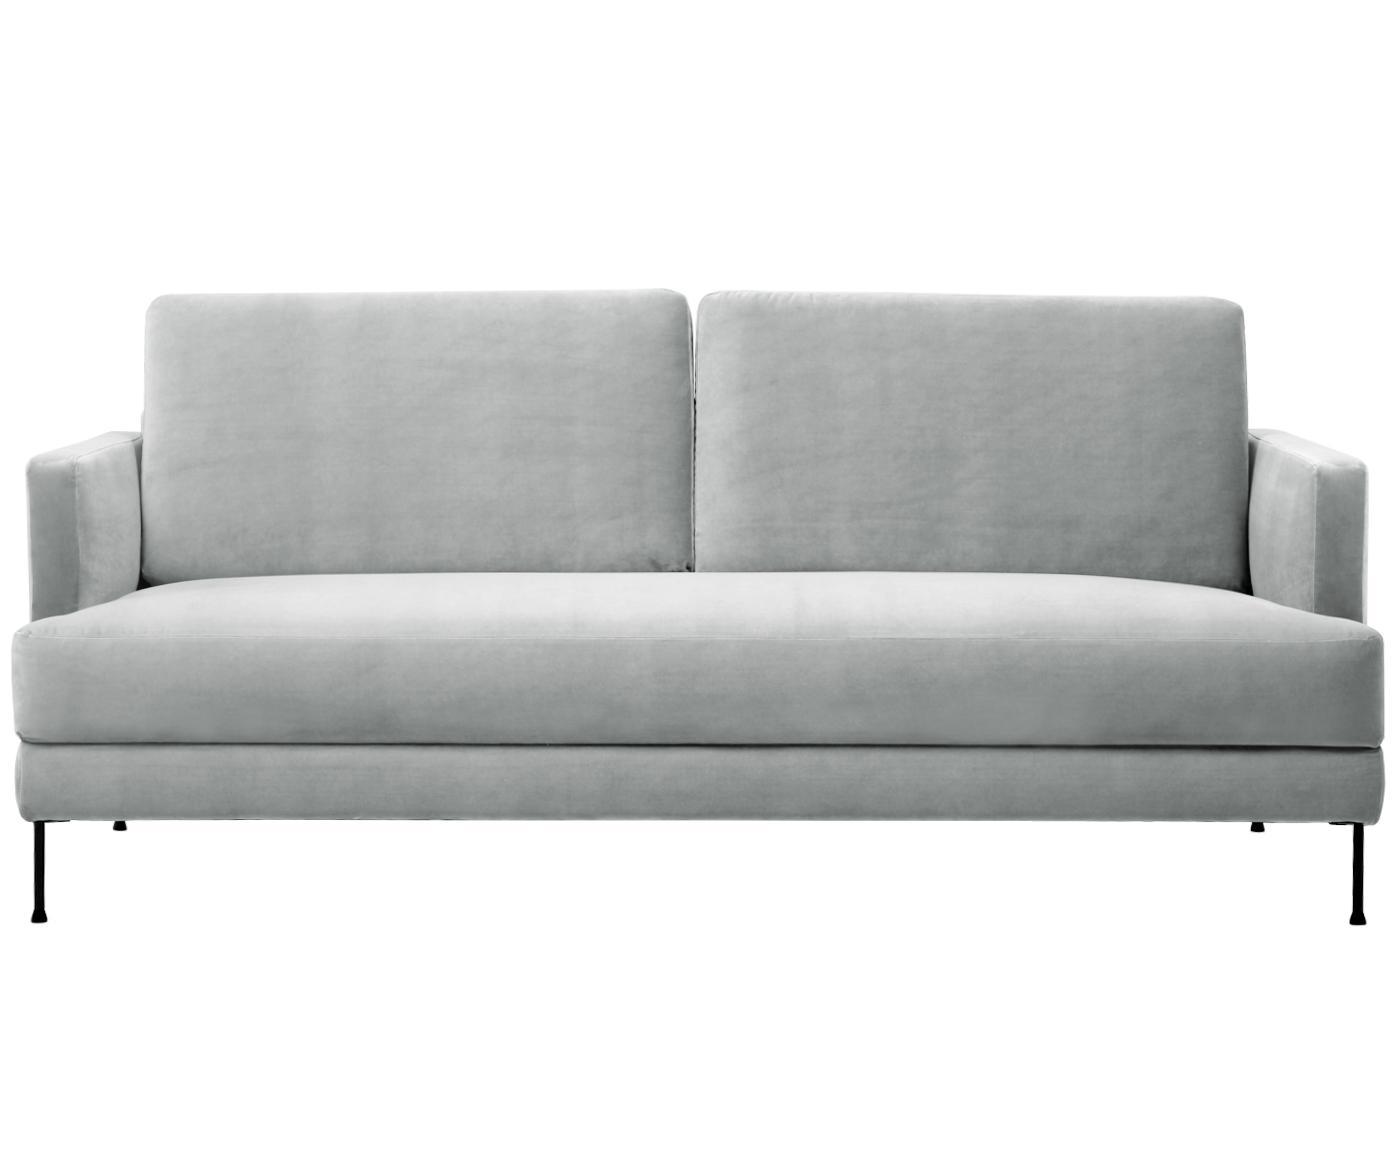 Fluwelen bank Fluente (3-zits), Bekleding: fluweel (hoogwaardig poly, Frame: massief grenenhout, Poten: gelakt metaal, Lichtgrijs, B 197 x D 83 cm